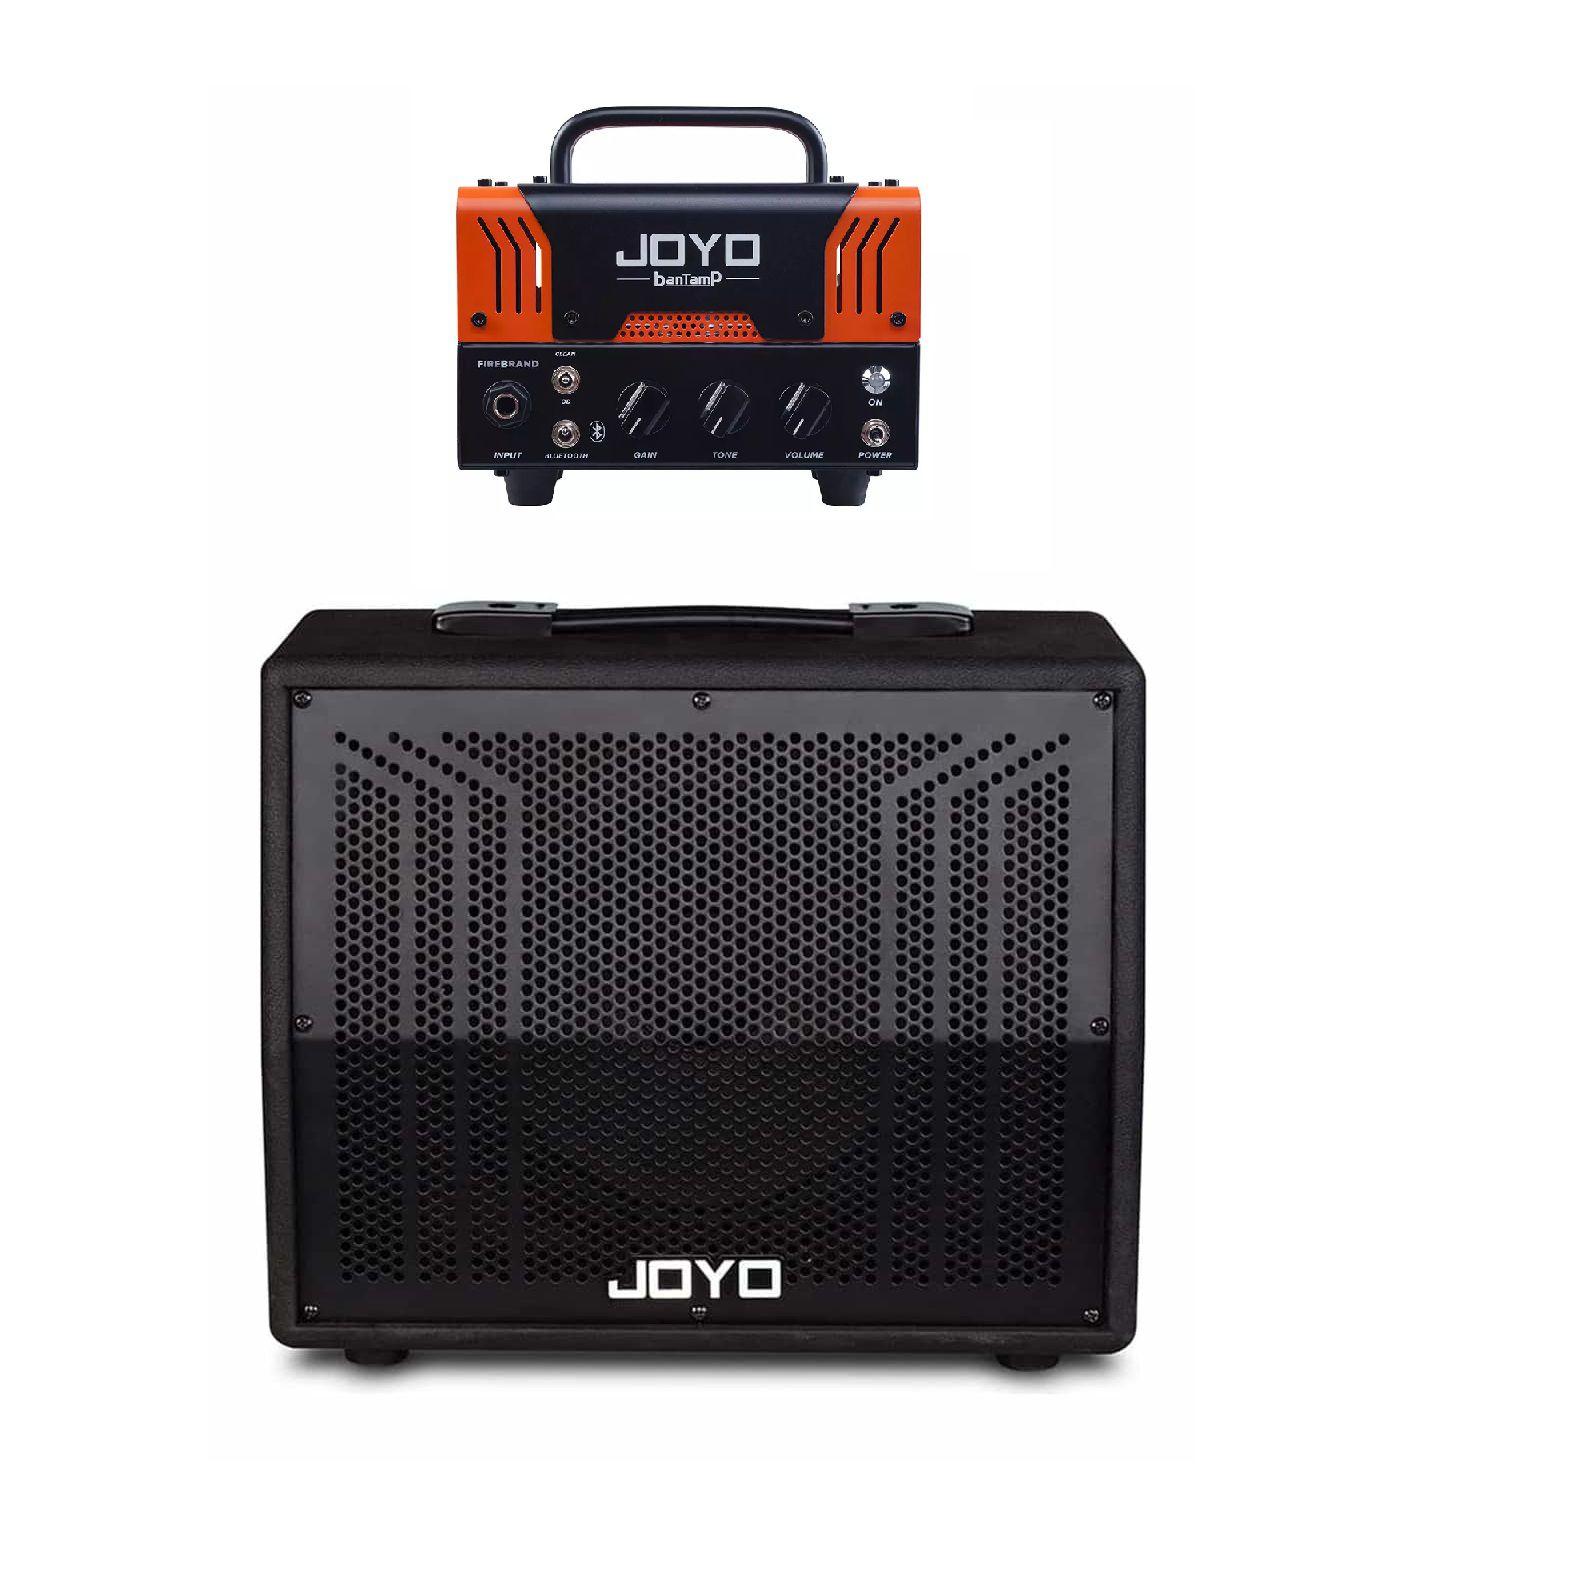 Amplificador Pré-valvulado Joyo Bantamp Firegrand ( Engl Fireball )